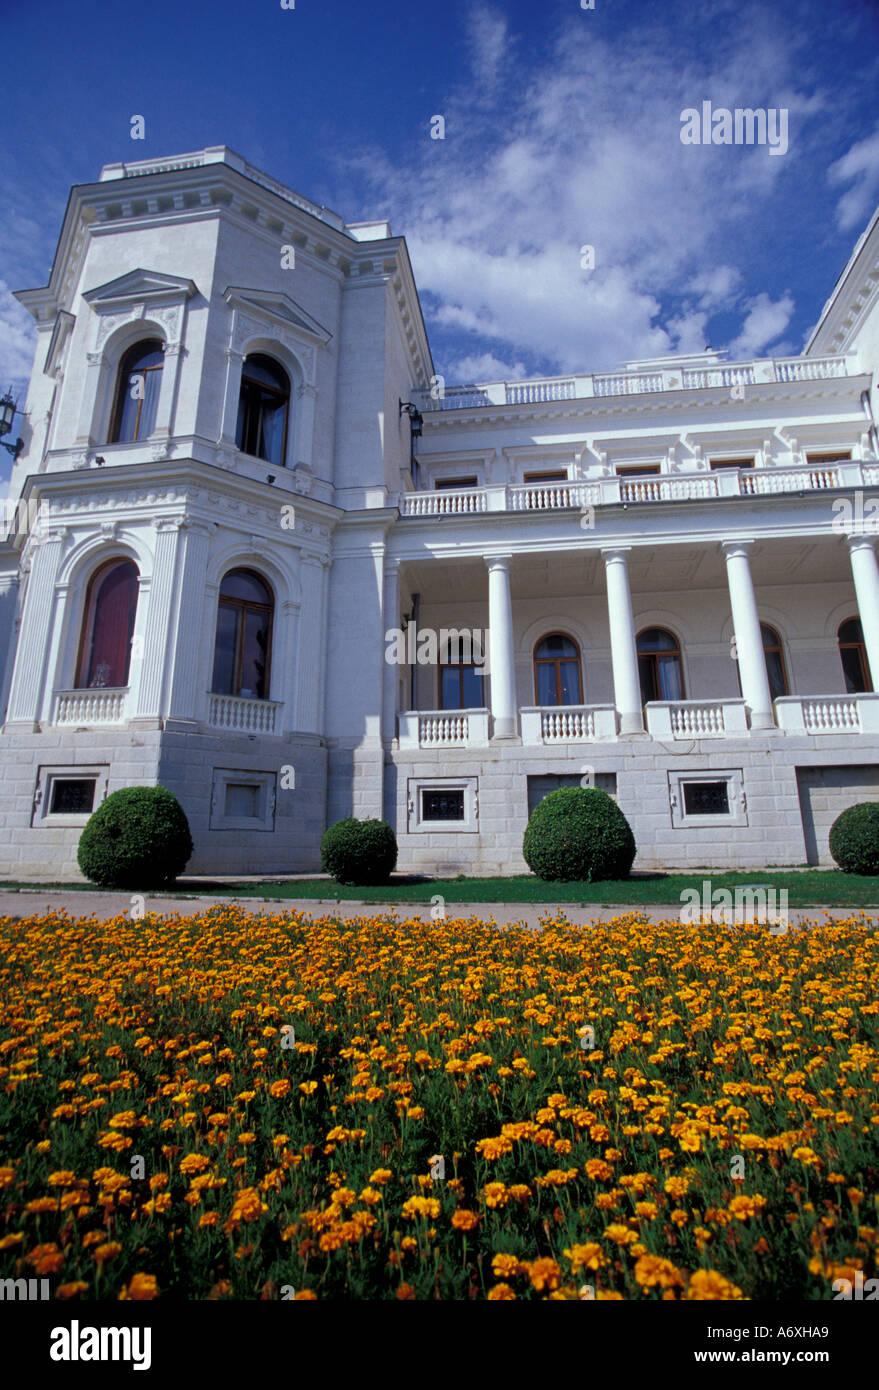 EU, Ukraine, Yalta, Livadiya, Tsar Nicholas II summer palace; site of 1945 Yalta Convention, garden - Stock Image